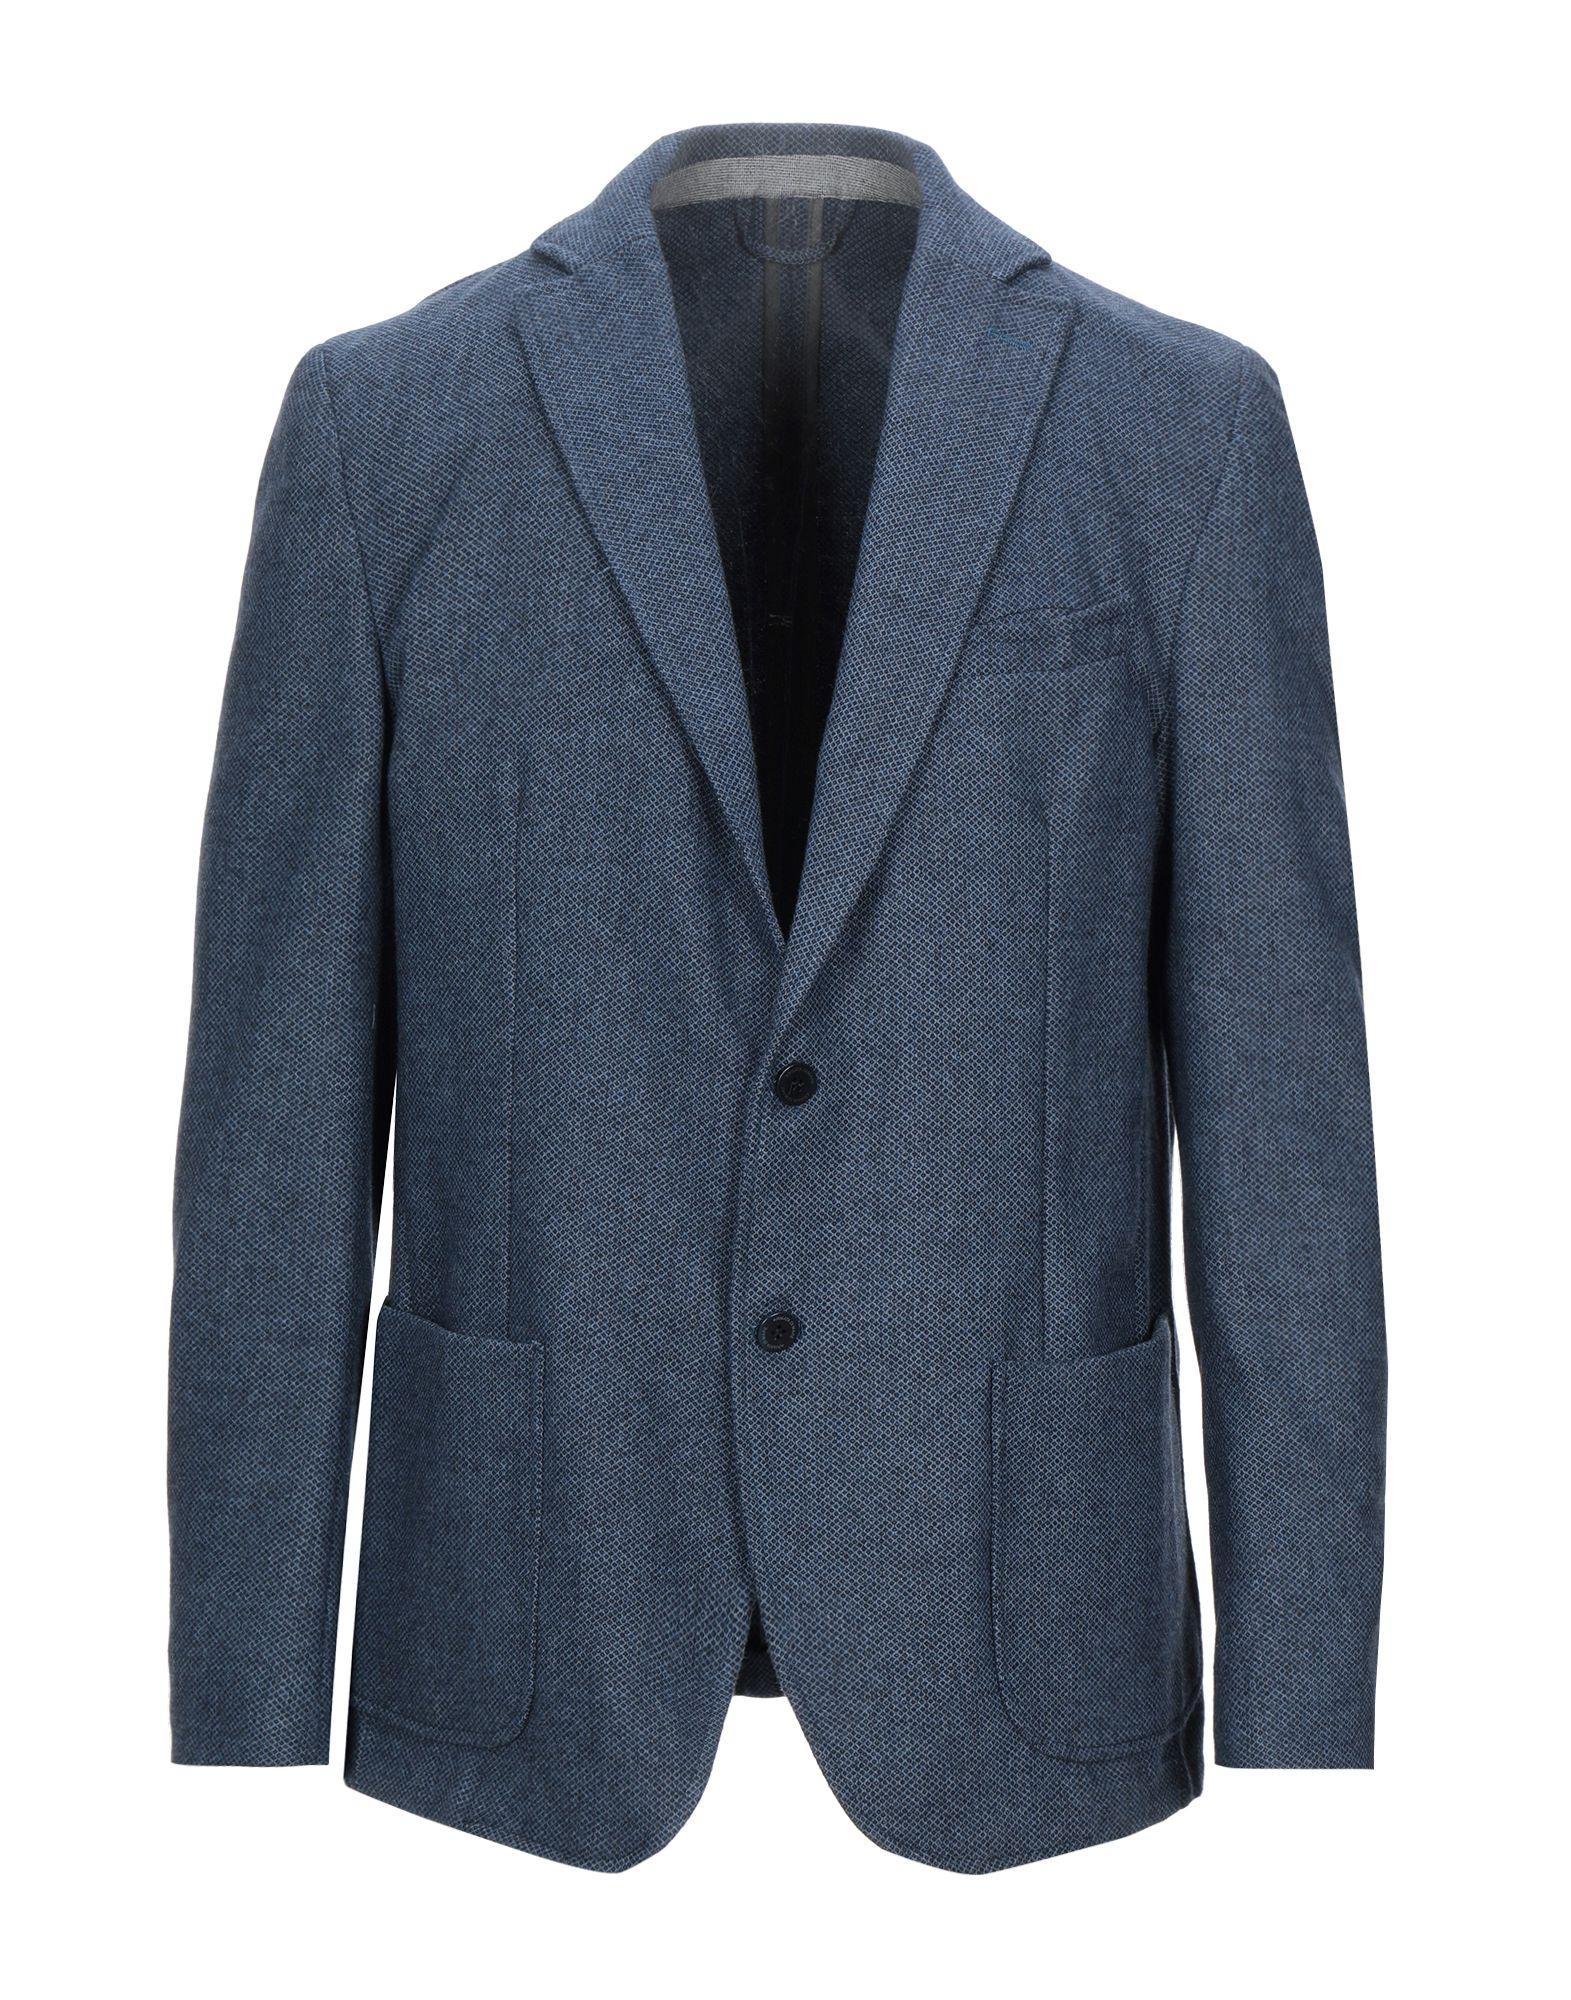 Фото - ARMATA DI MARE Пиджак leather jacket giorgio di mare куртки короткие